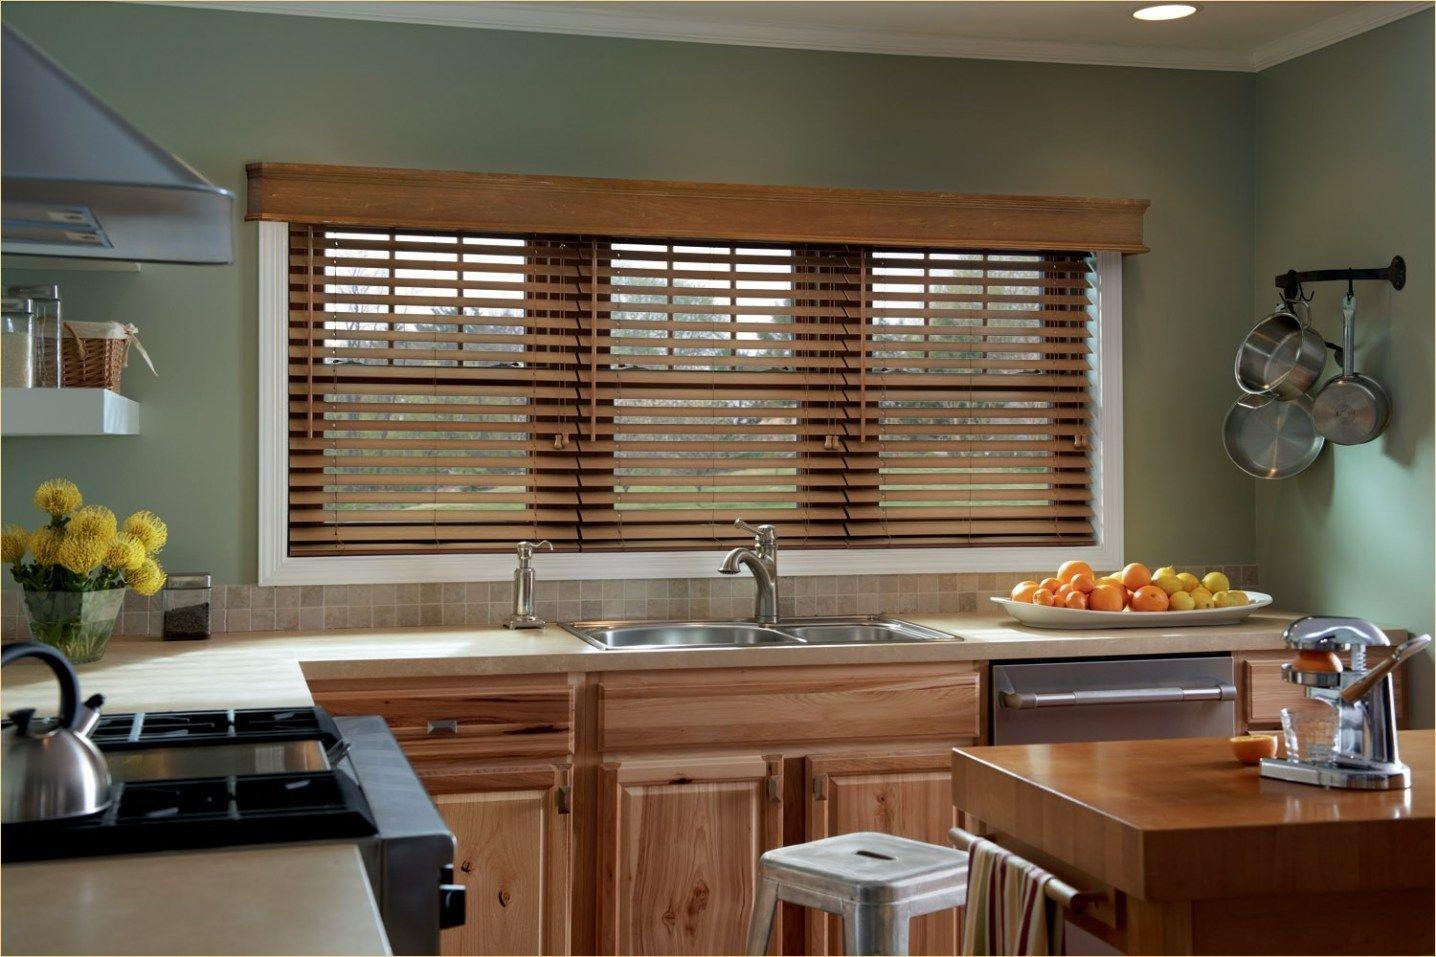 51 Stunning Oak Kitchen With Blinds Ideas Decorecord Kitchen